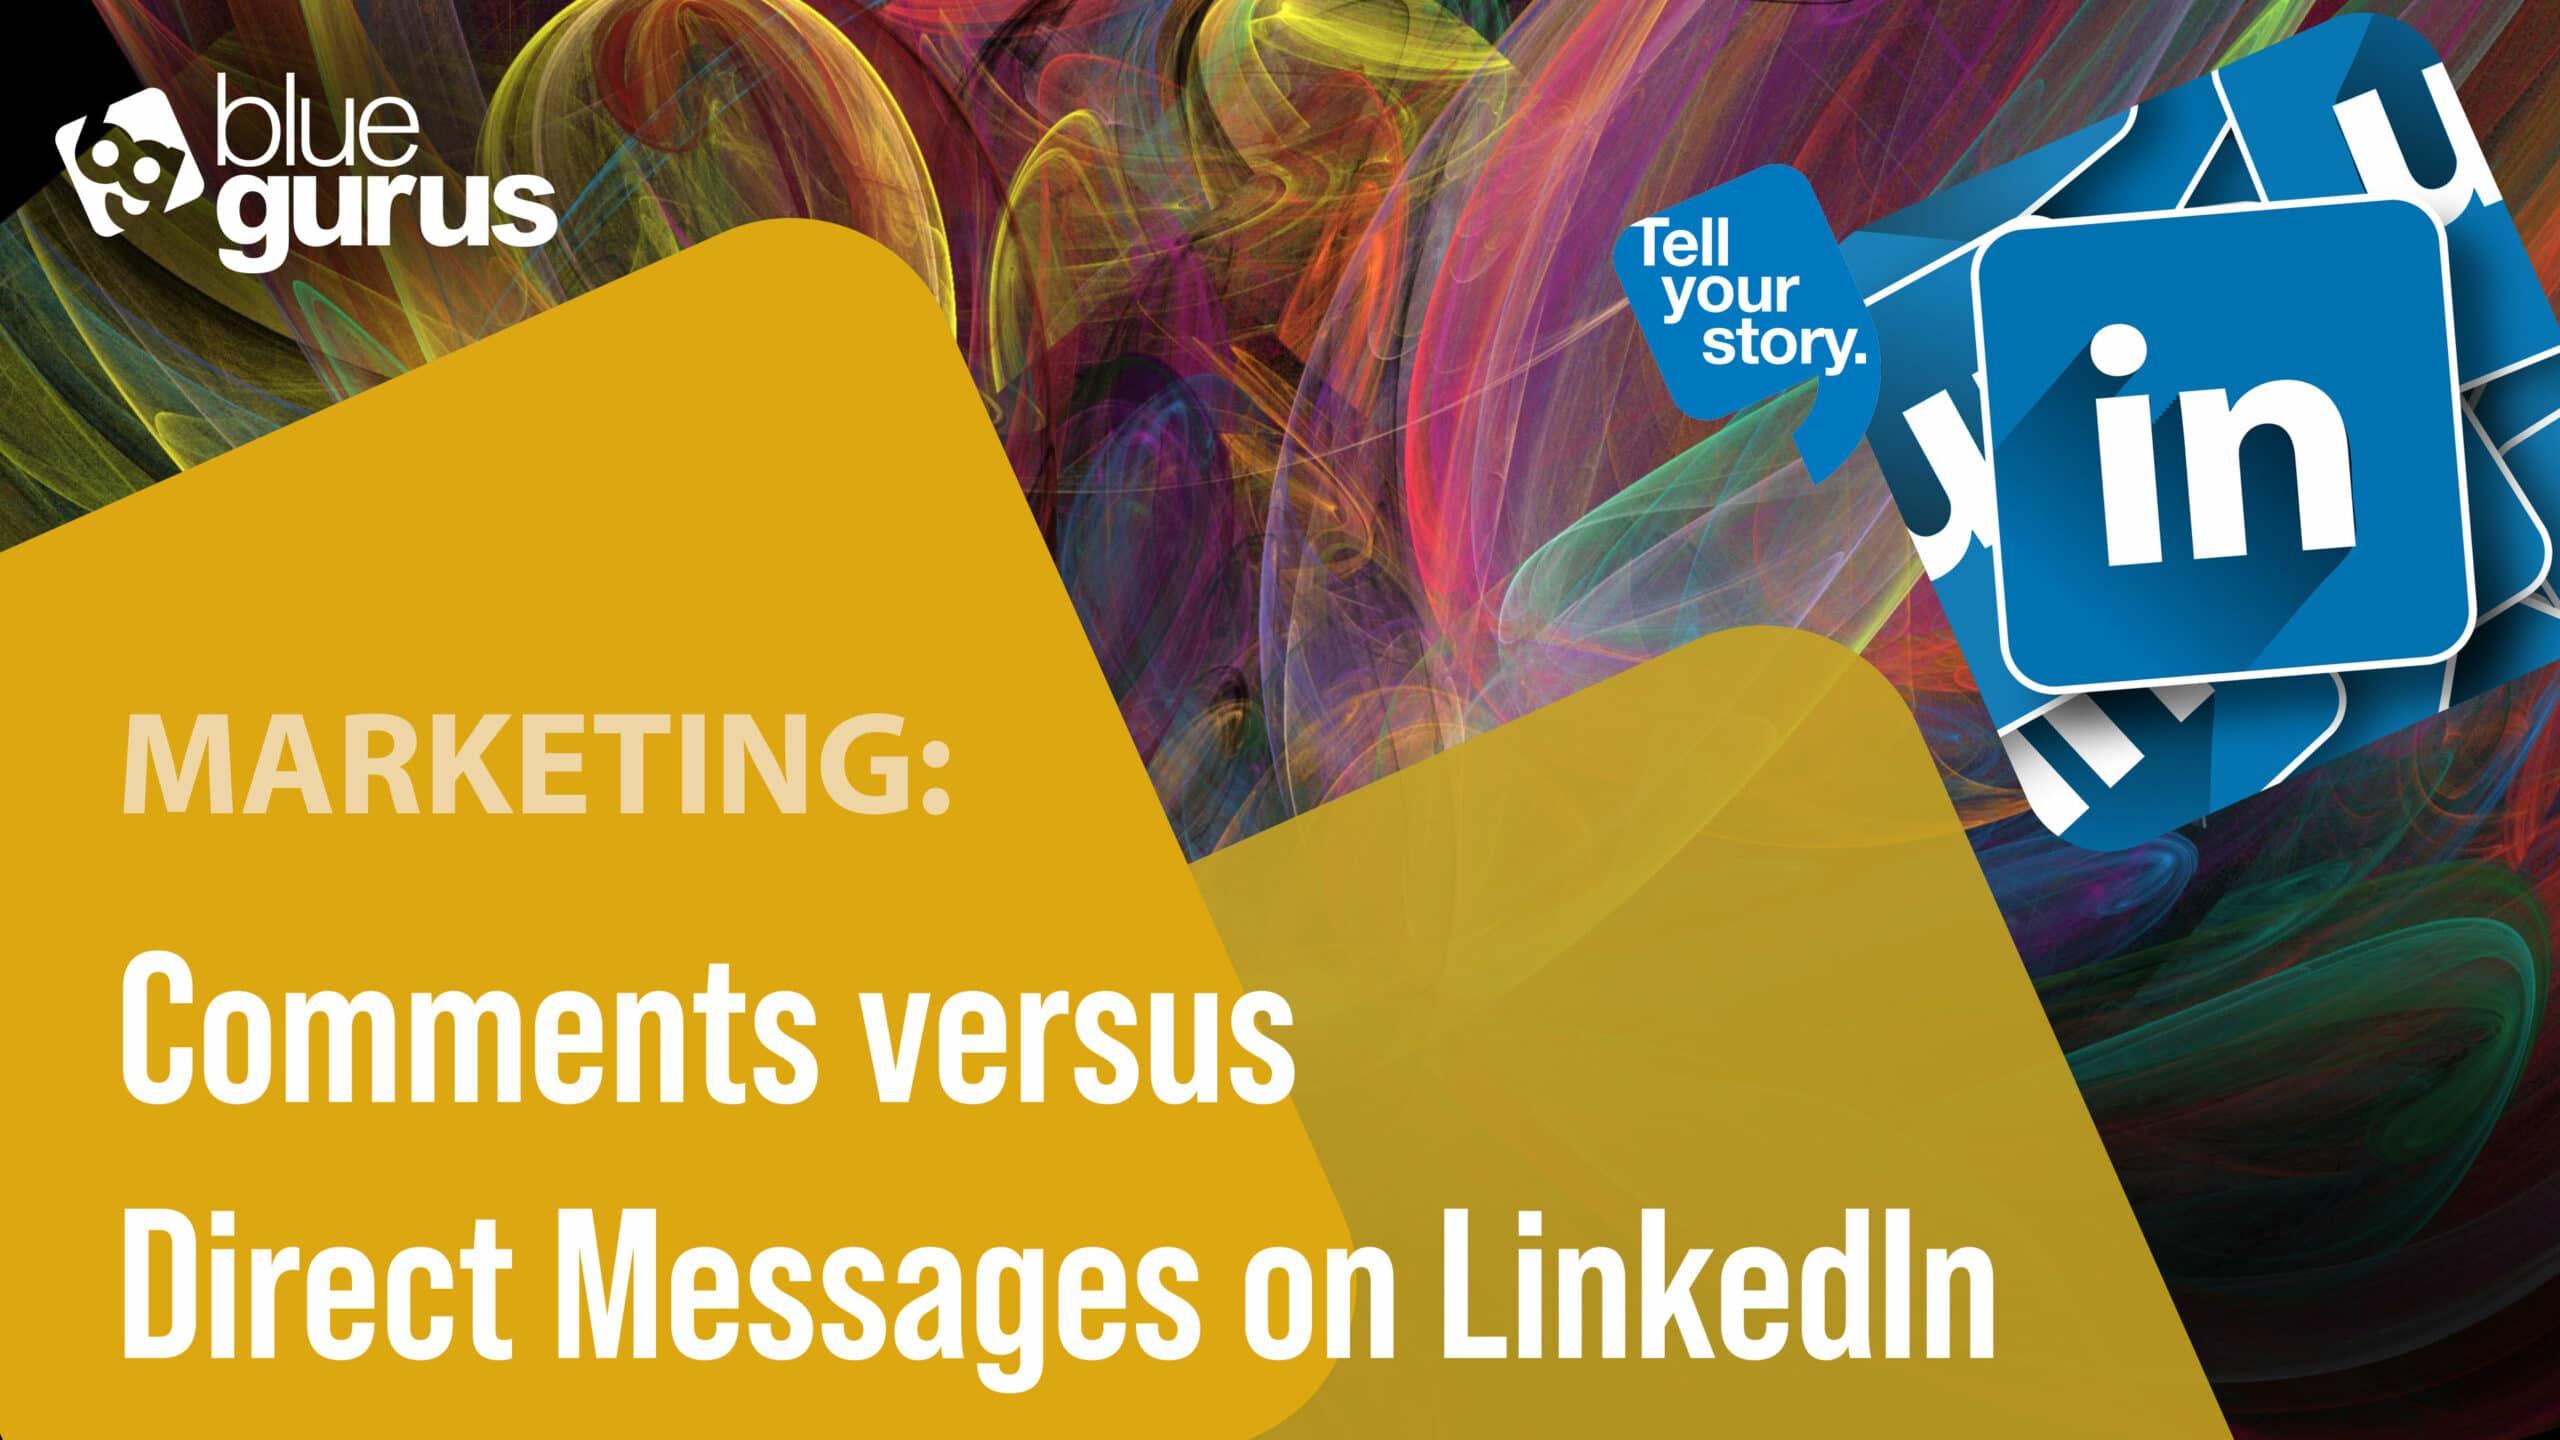 Comments versus Direct Messages on LinkedIn